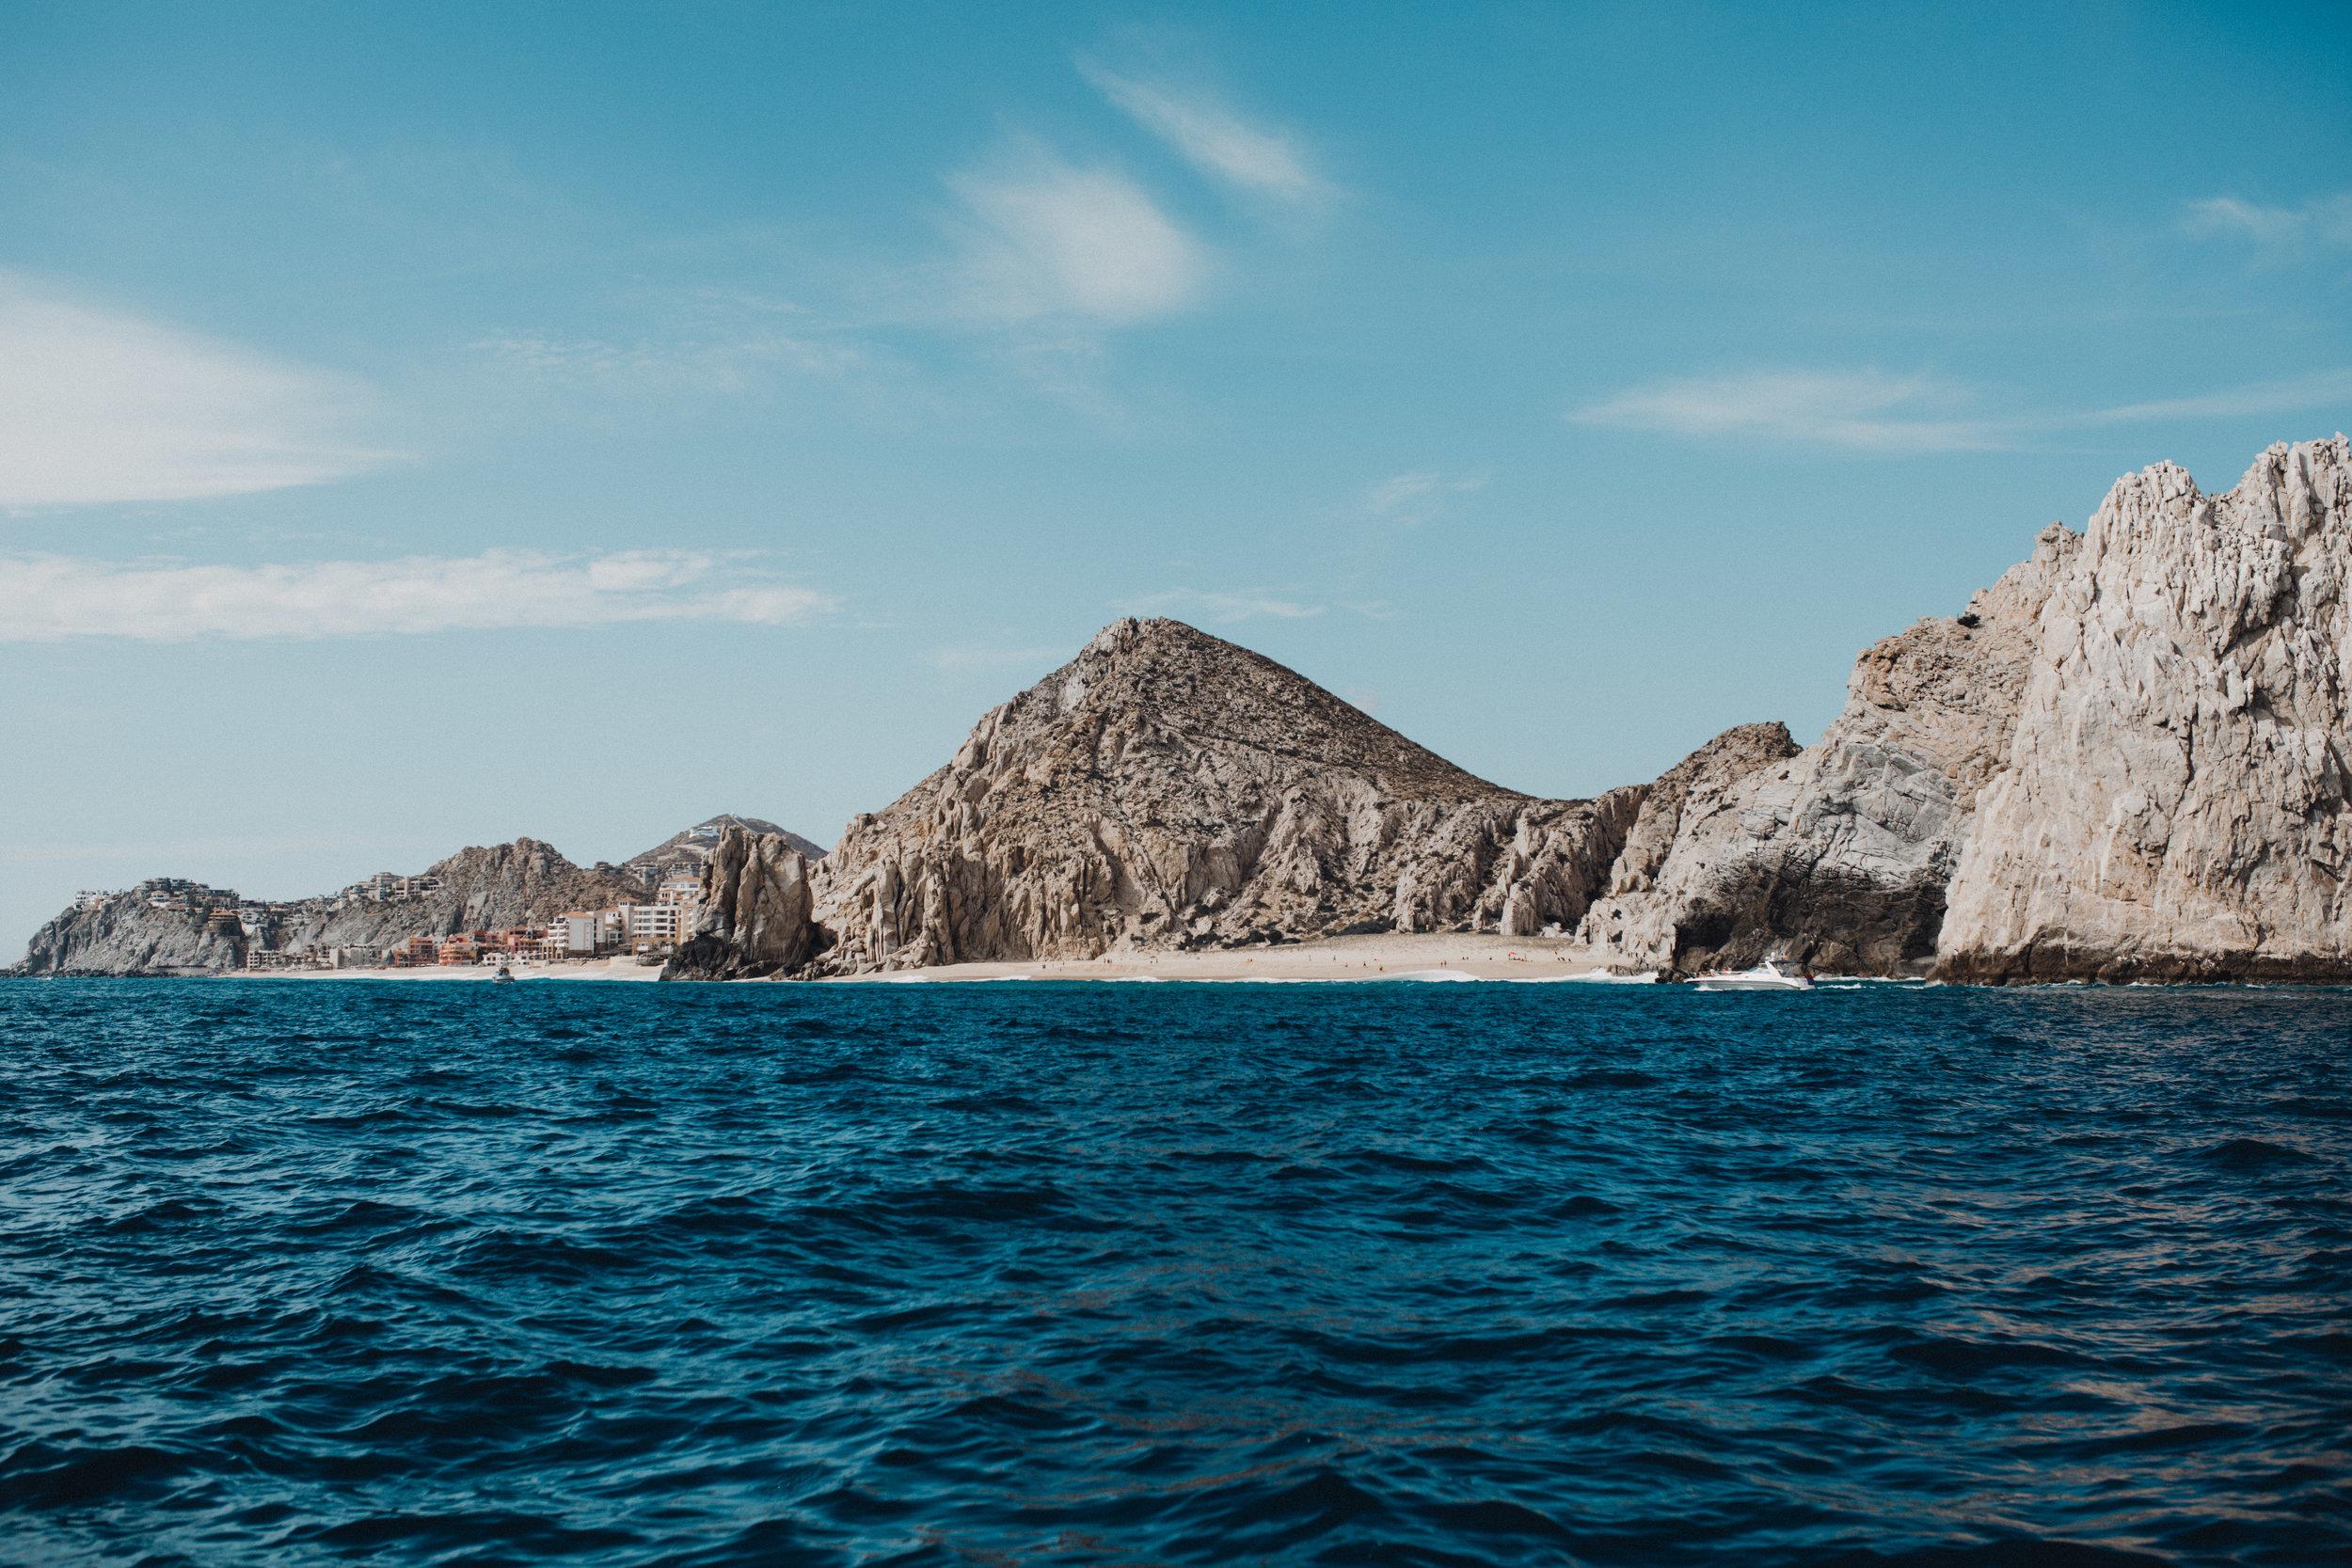 Cabo_1216_0281.jpg